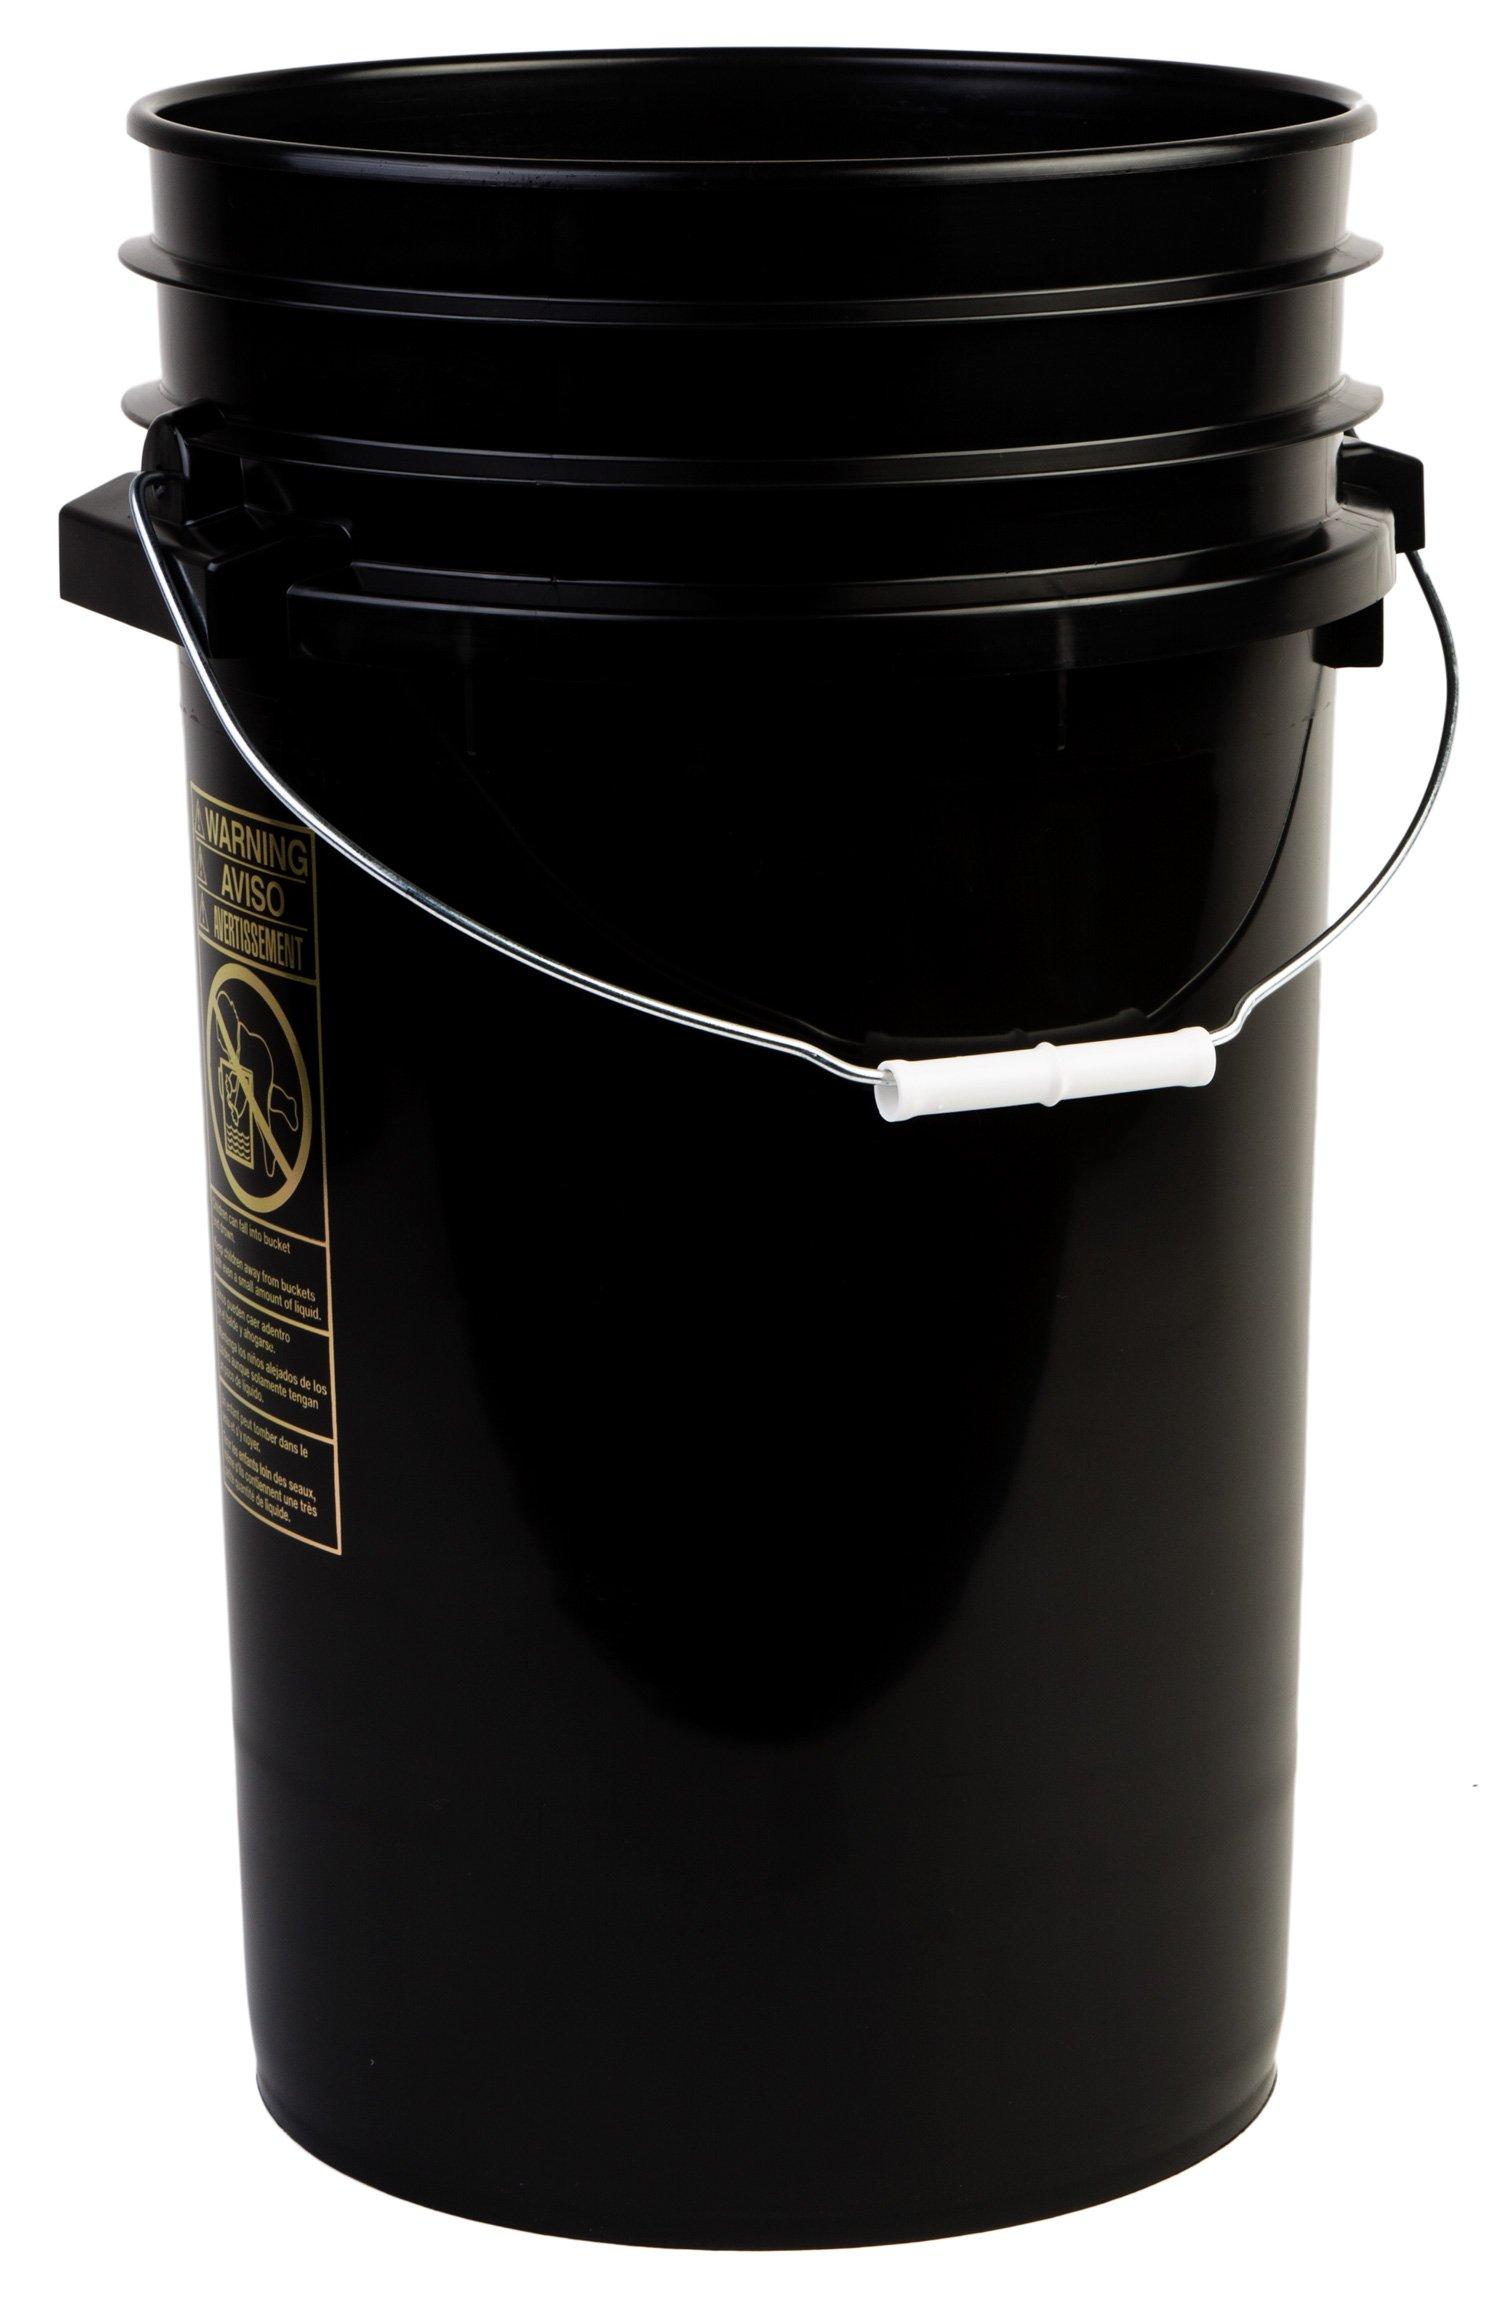 Hudson Exchange Premium 7 Gallon Bucket, HDPE, Black, 8 Pack